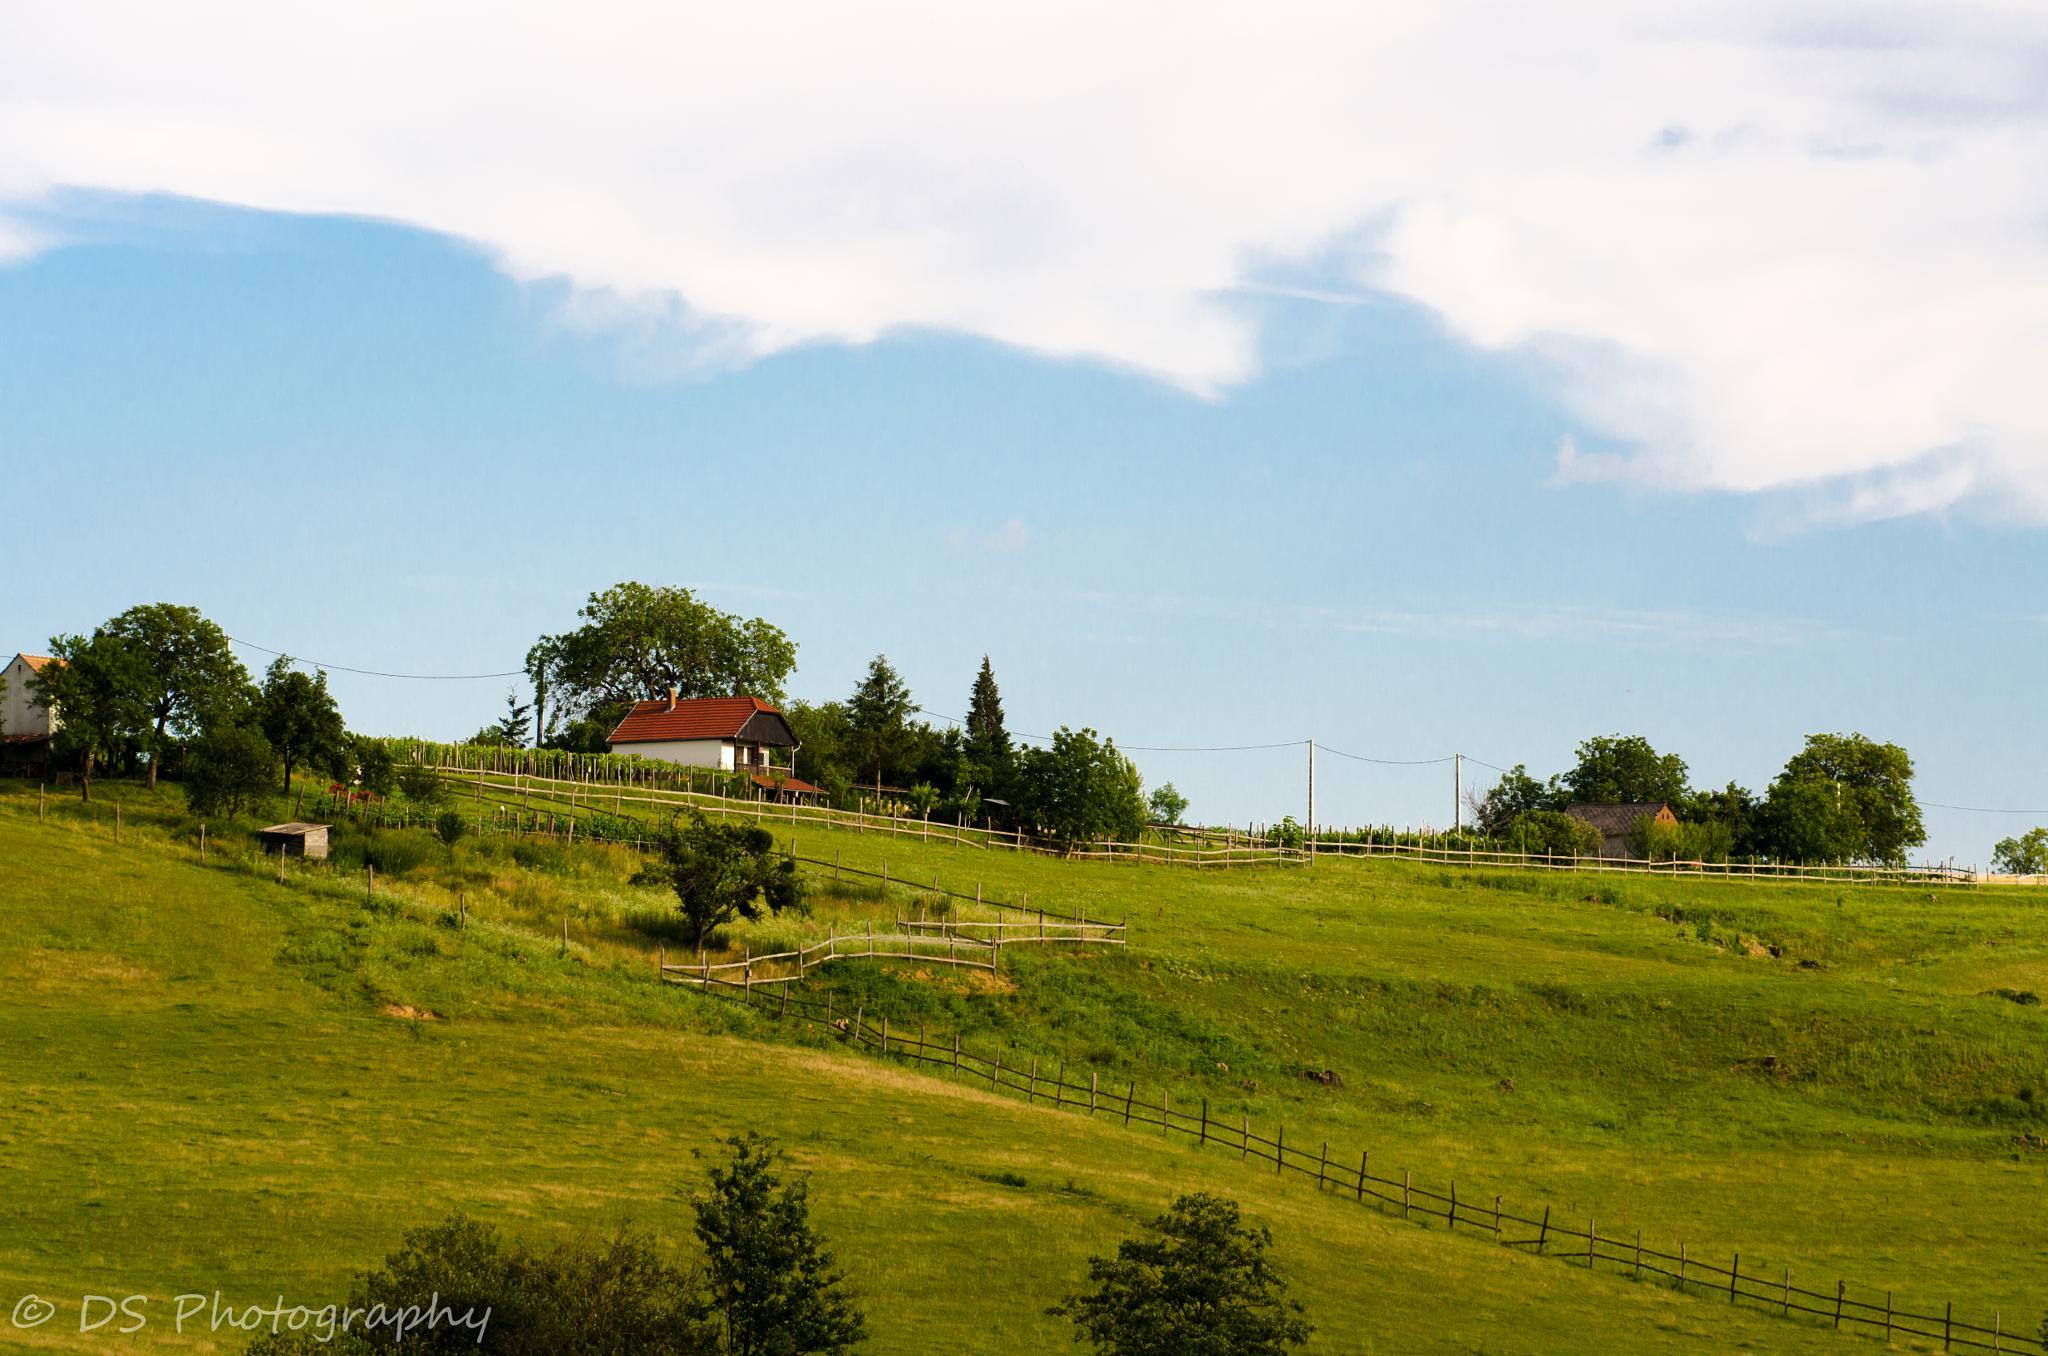 house on the hill by Dombora Sándor